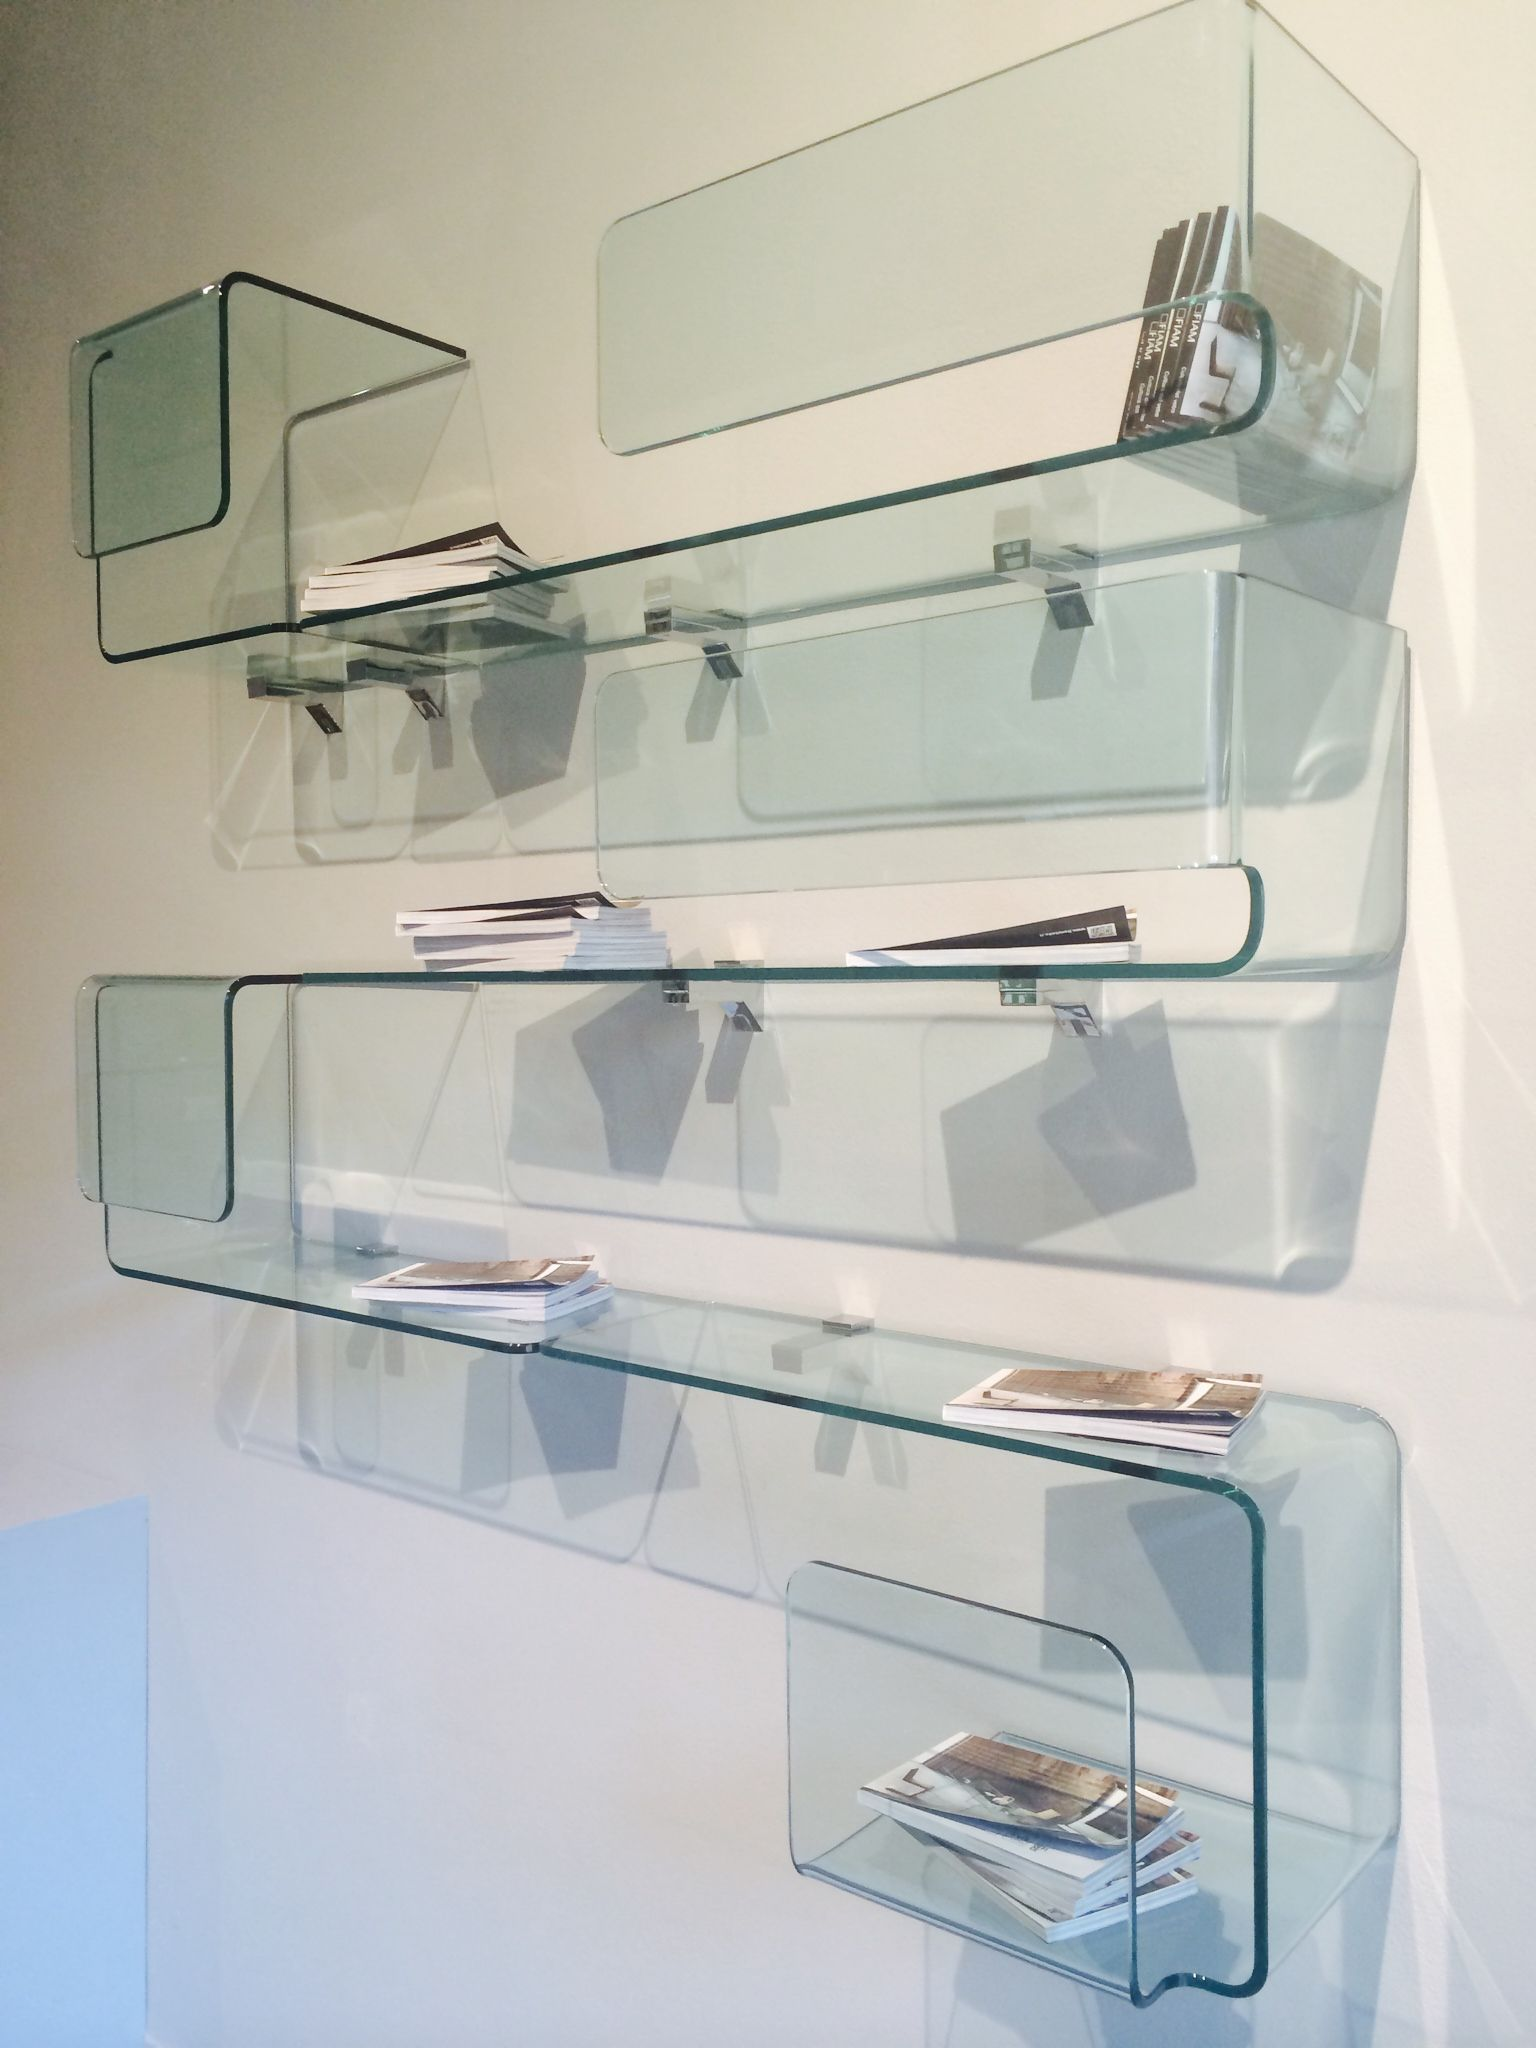 Wonderful Foulard Mensola Vetro Curvato Trasparente Design #Studio Klass #FIAM Italia Gallery